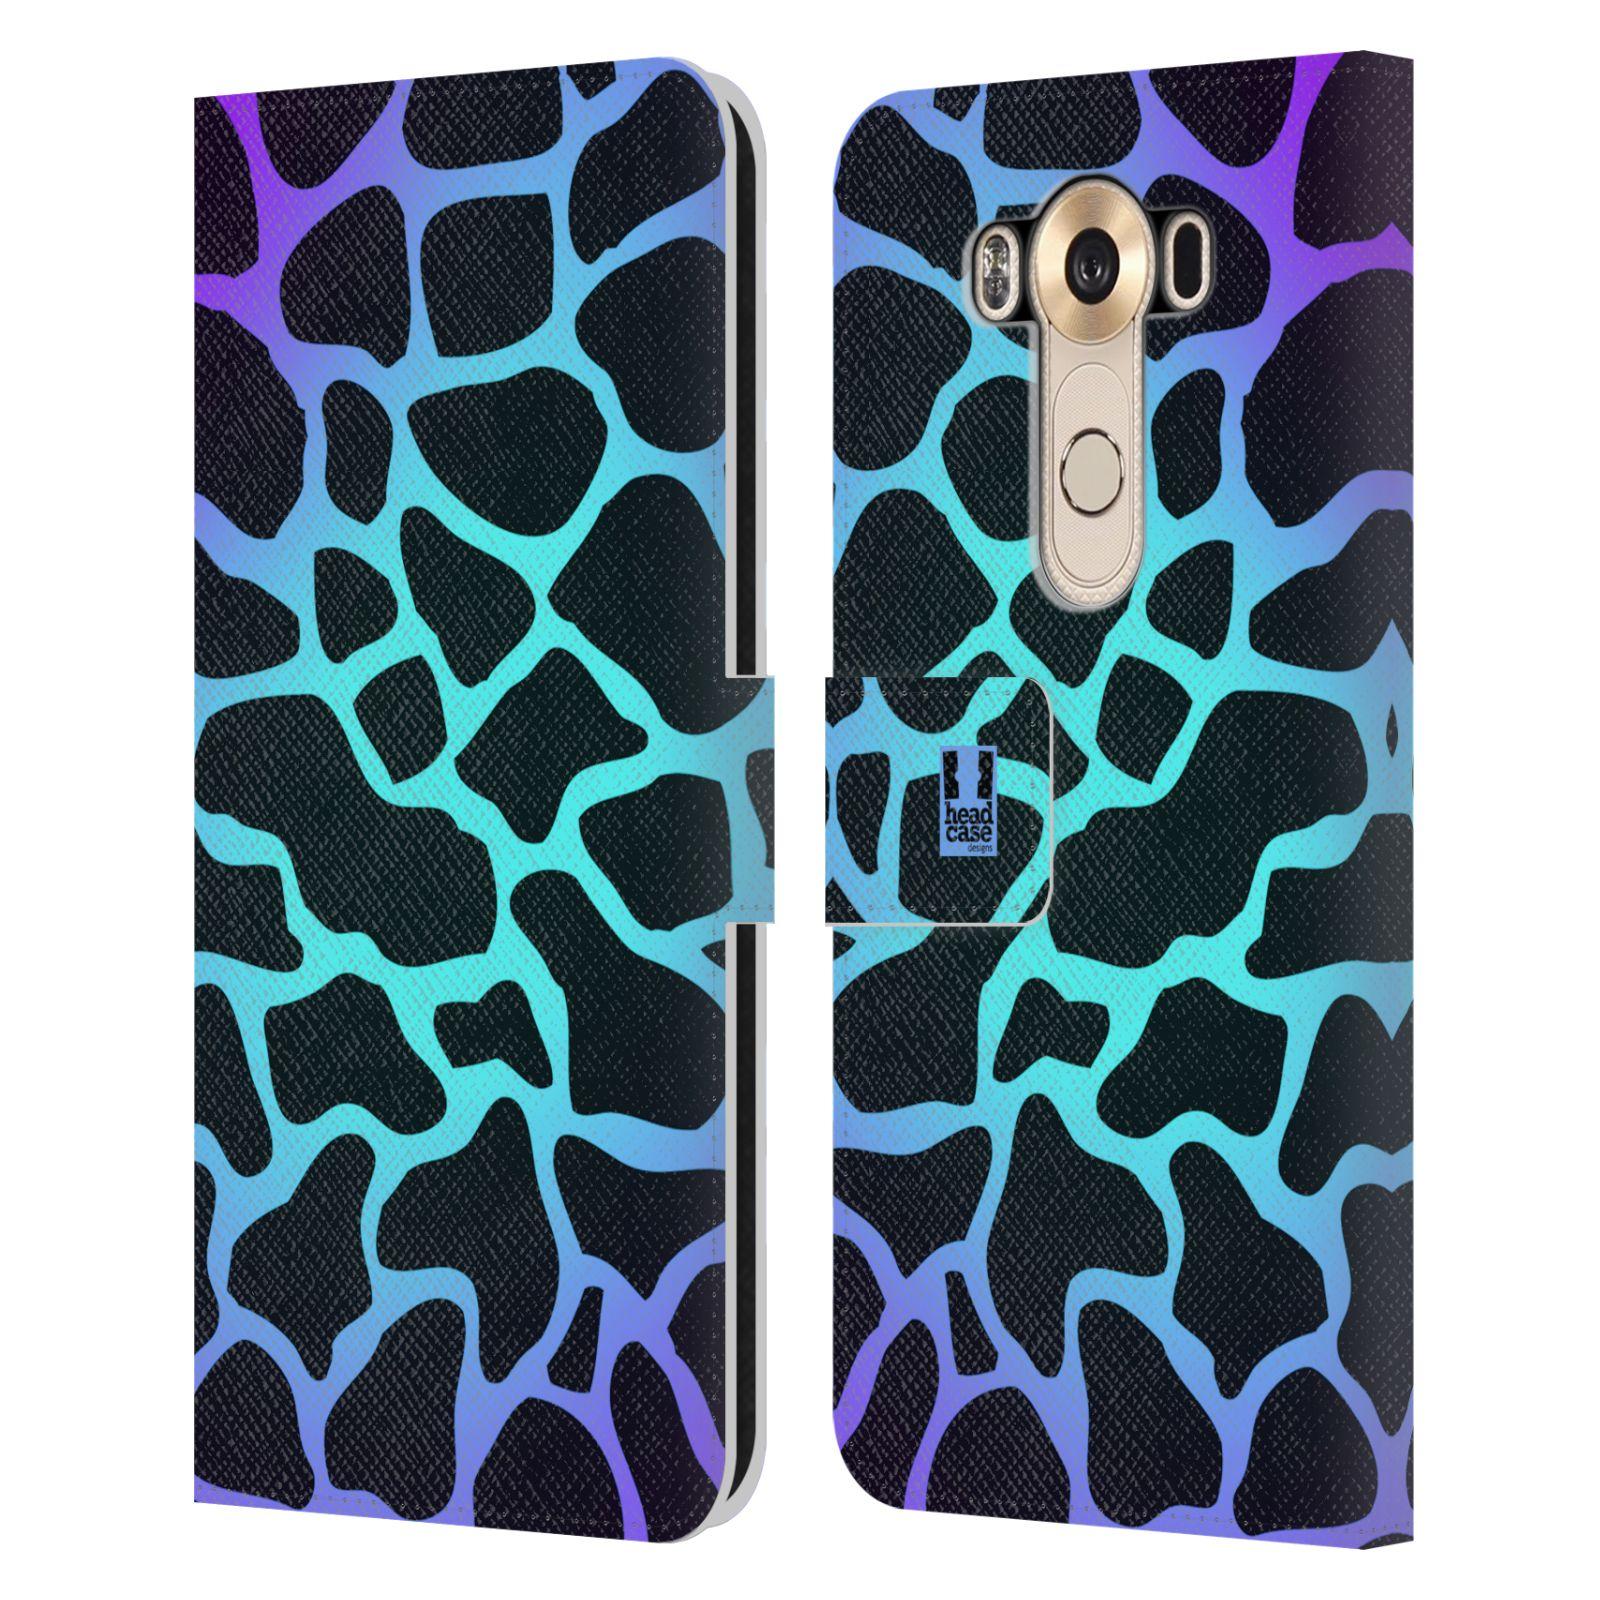 HEAD CASE Flipové pouzdro pro mobil LG V10 Zvířecí barevné vzory magická tyrkysova žirafa